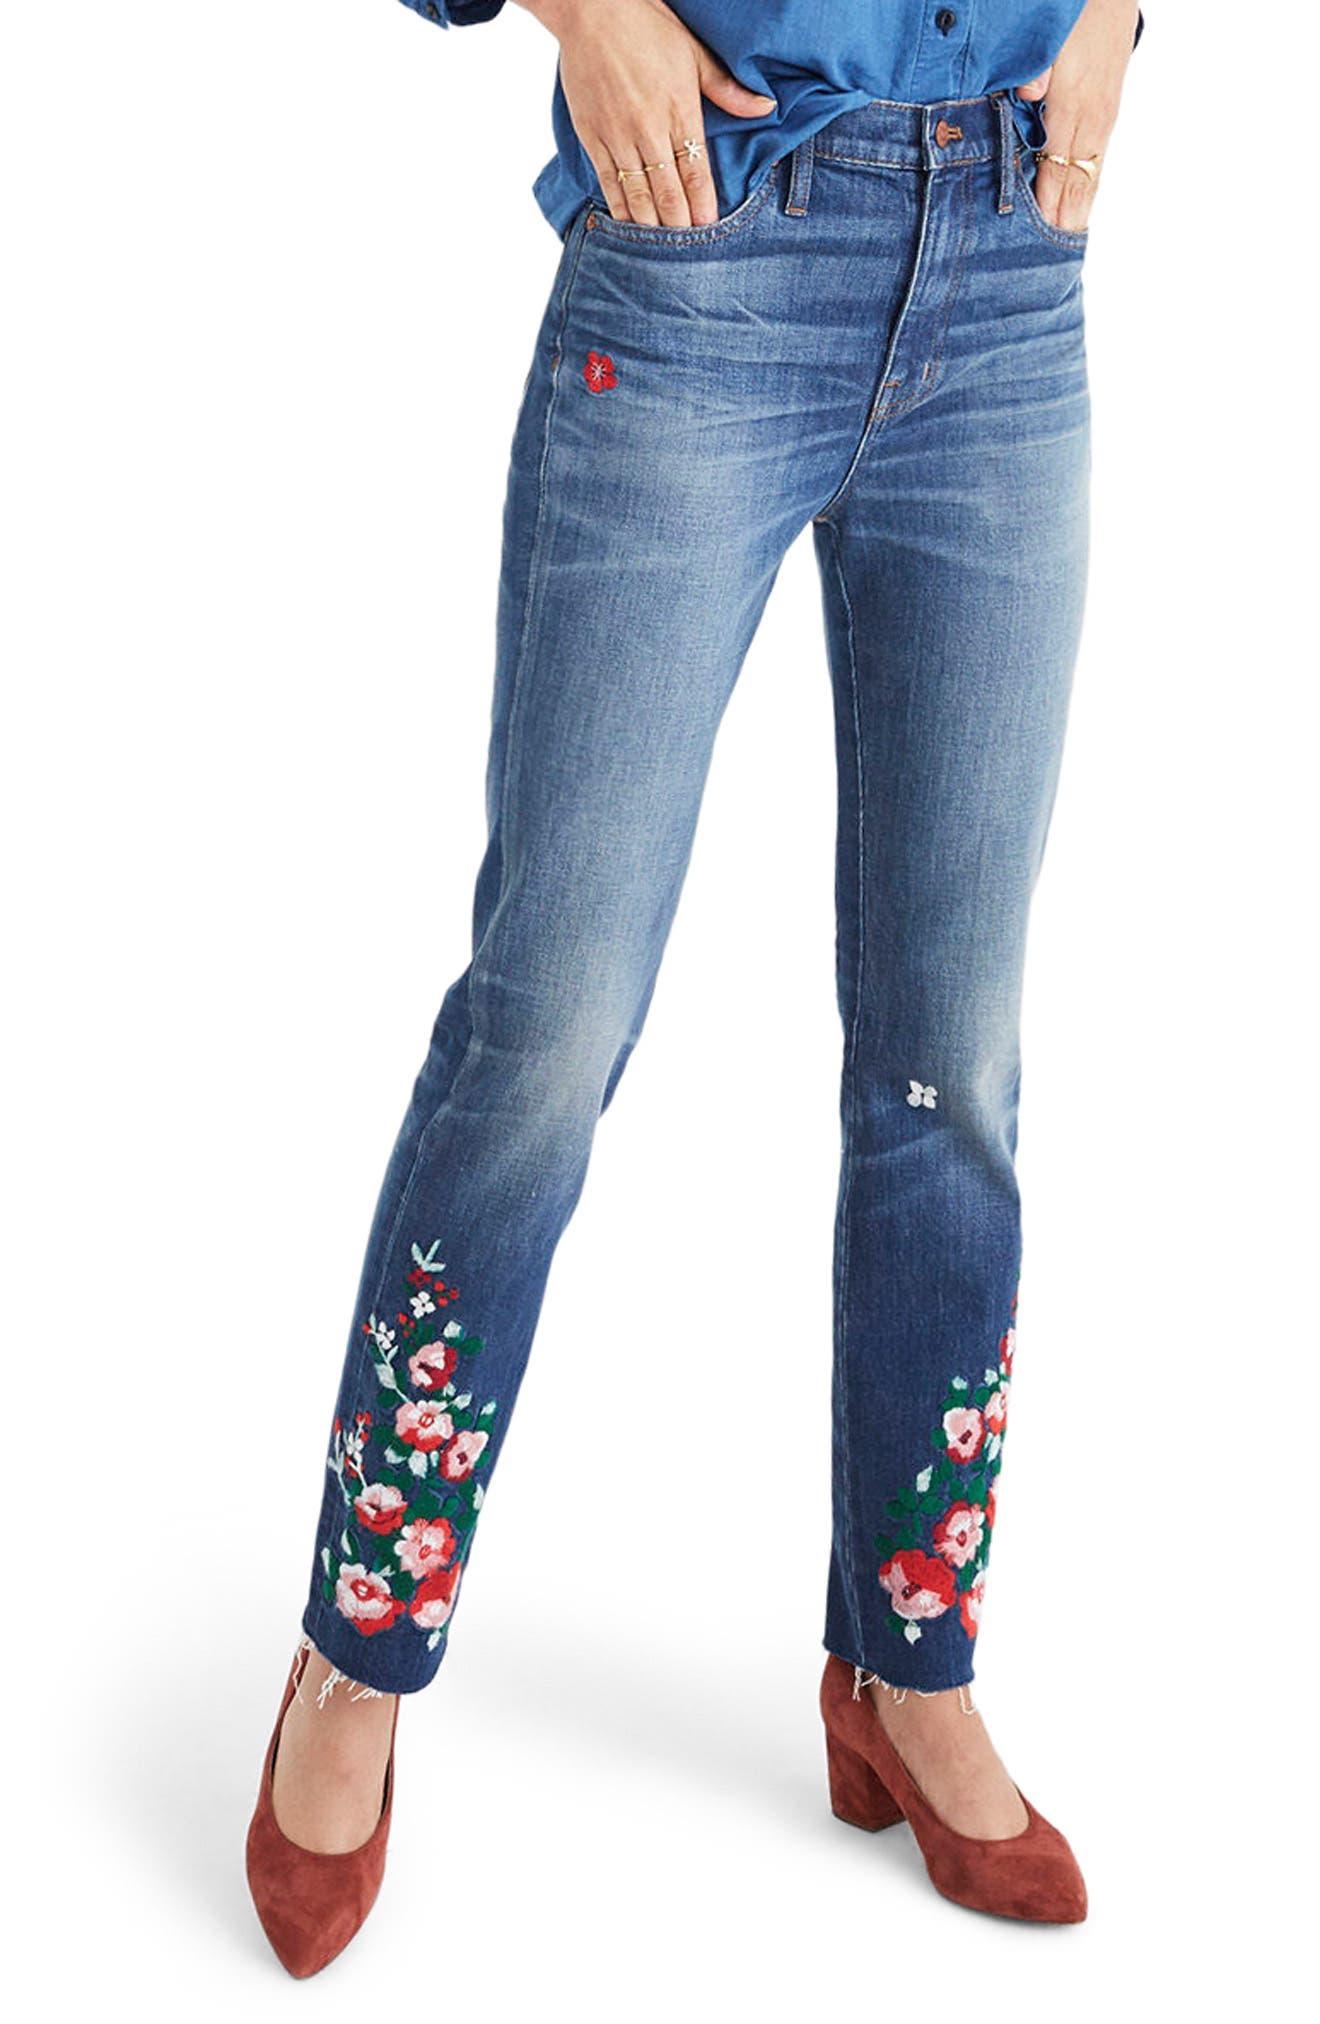 Madewell Embroidered High Waist Boyfriend Jeans (Carolin)